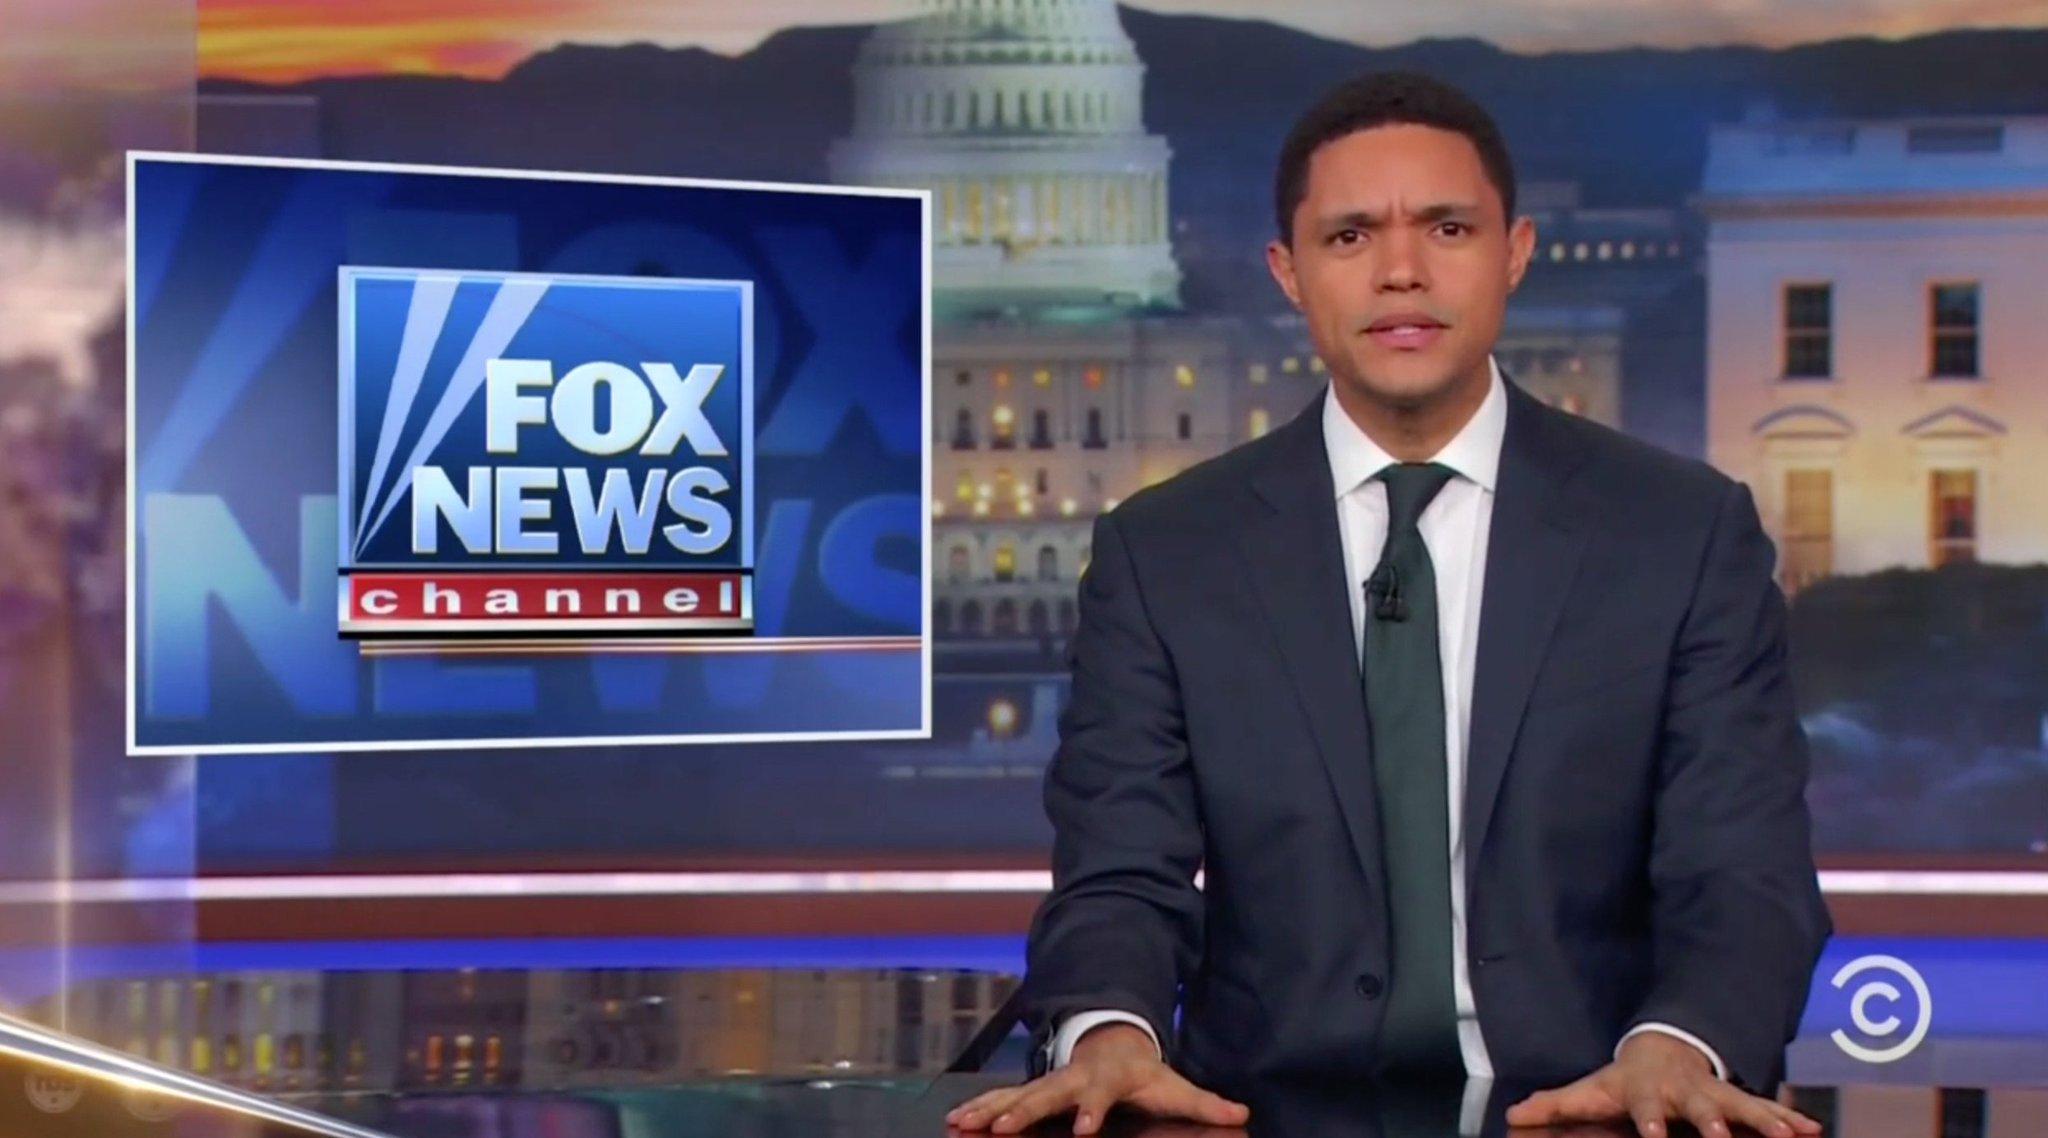 Trevor Noah Tells Fox News to 'Shut Up and Dribble' For Not Addressing Gun Control https://t.co/agTC807Qfs https://t.co/uqbR0Qrjr4